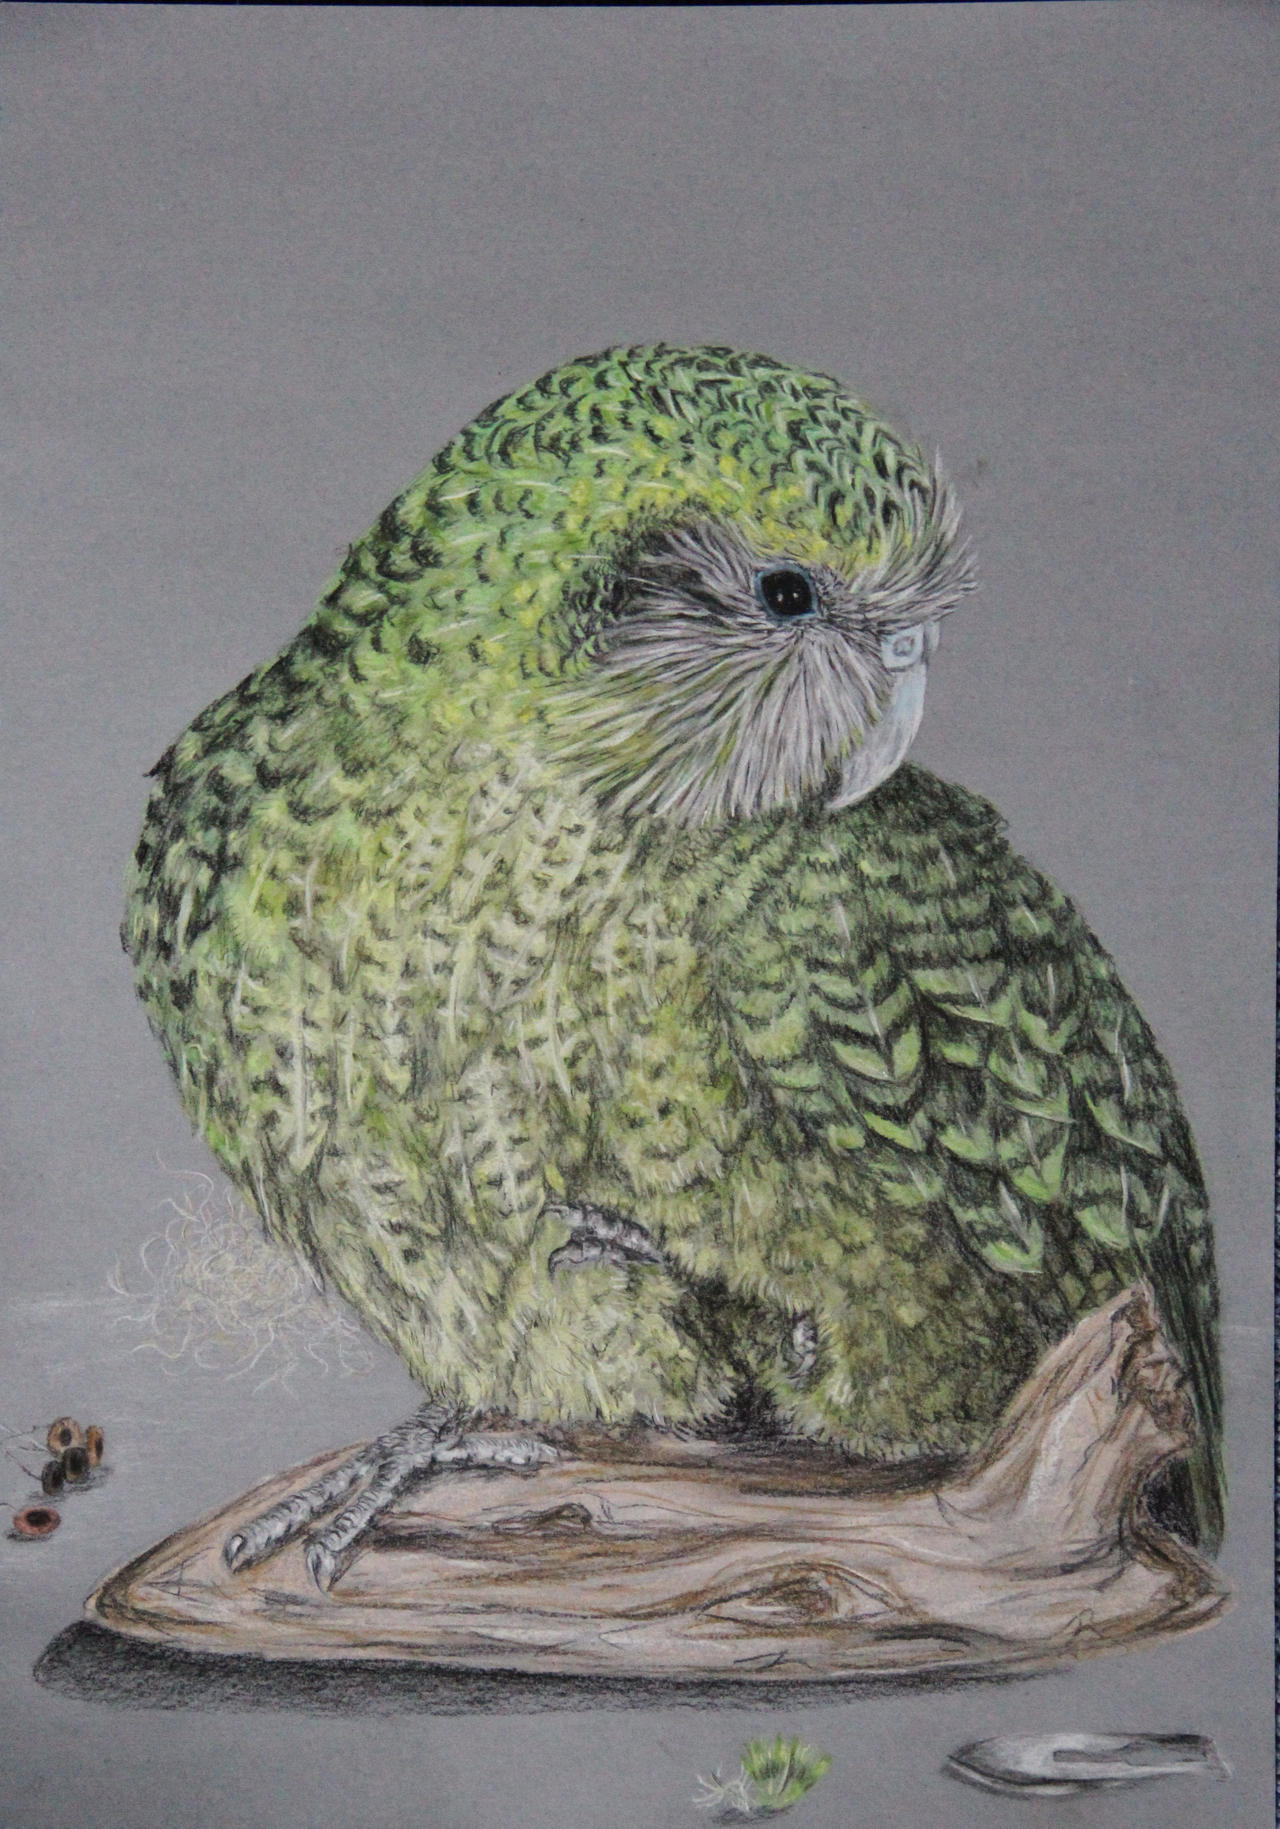 kakapo by cola93 on DeviantArt